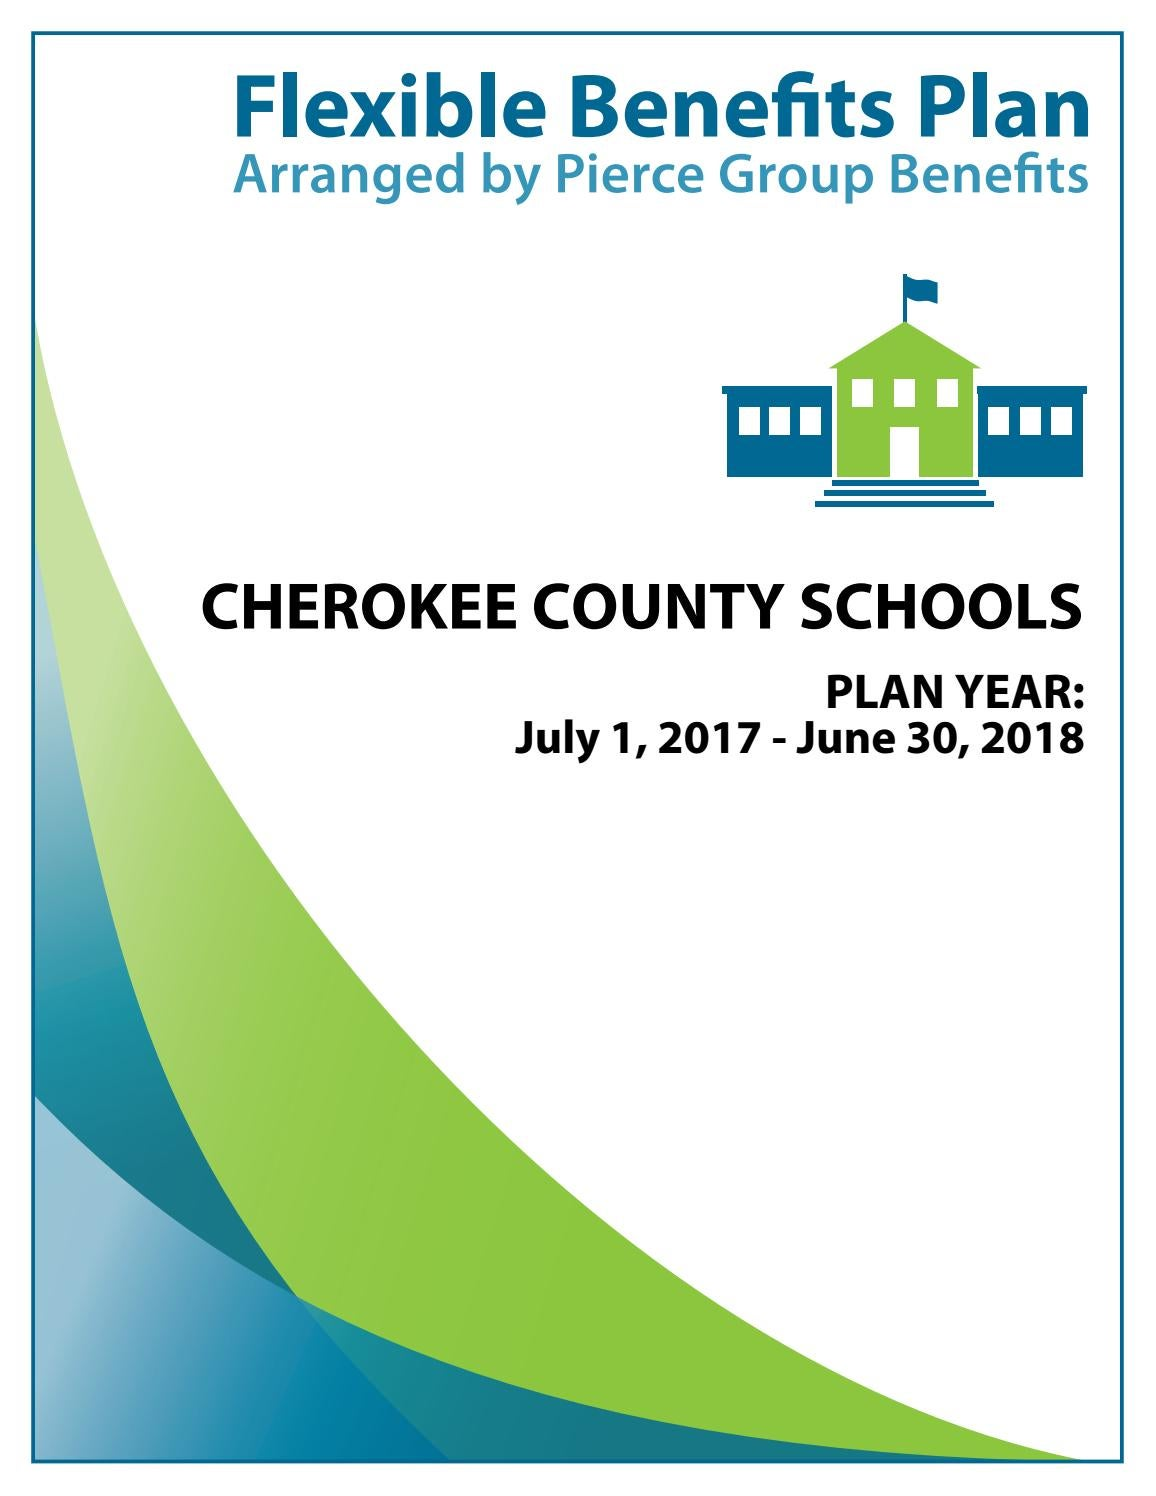 Cherokee County Schools 2017-2018 Plan Year by Pierce ...